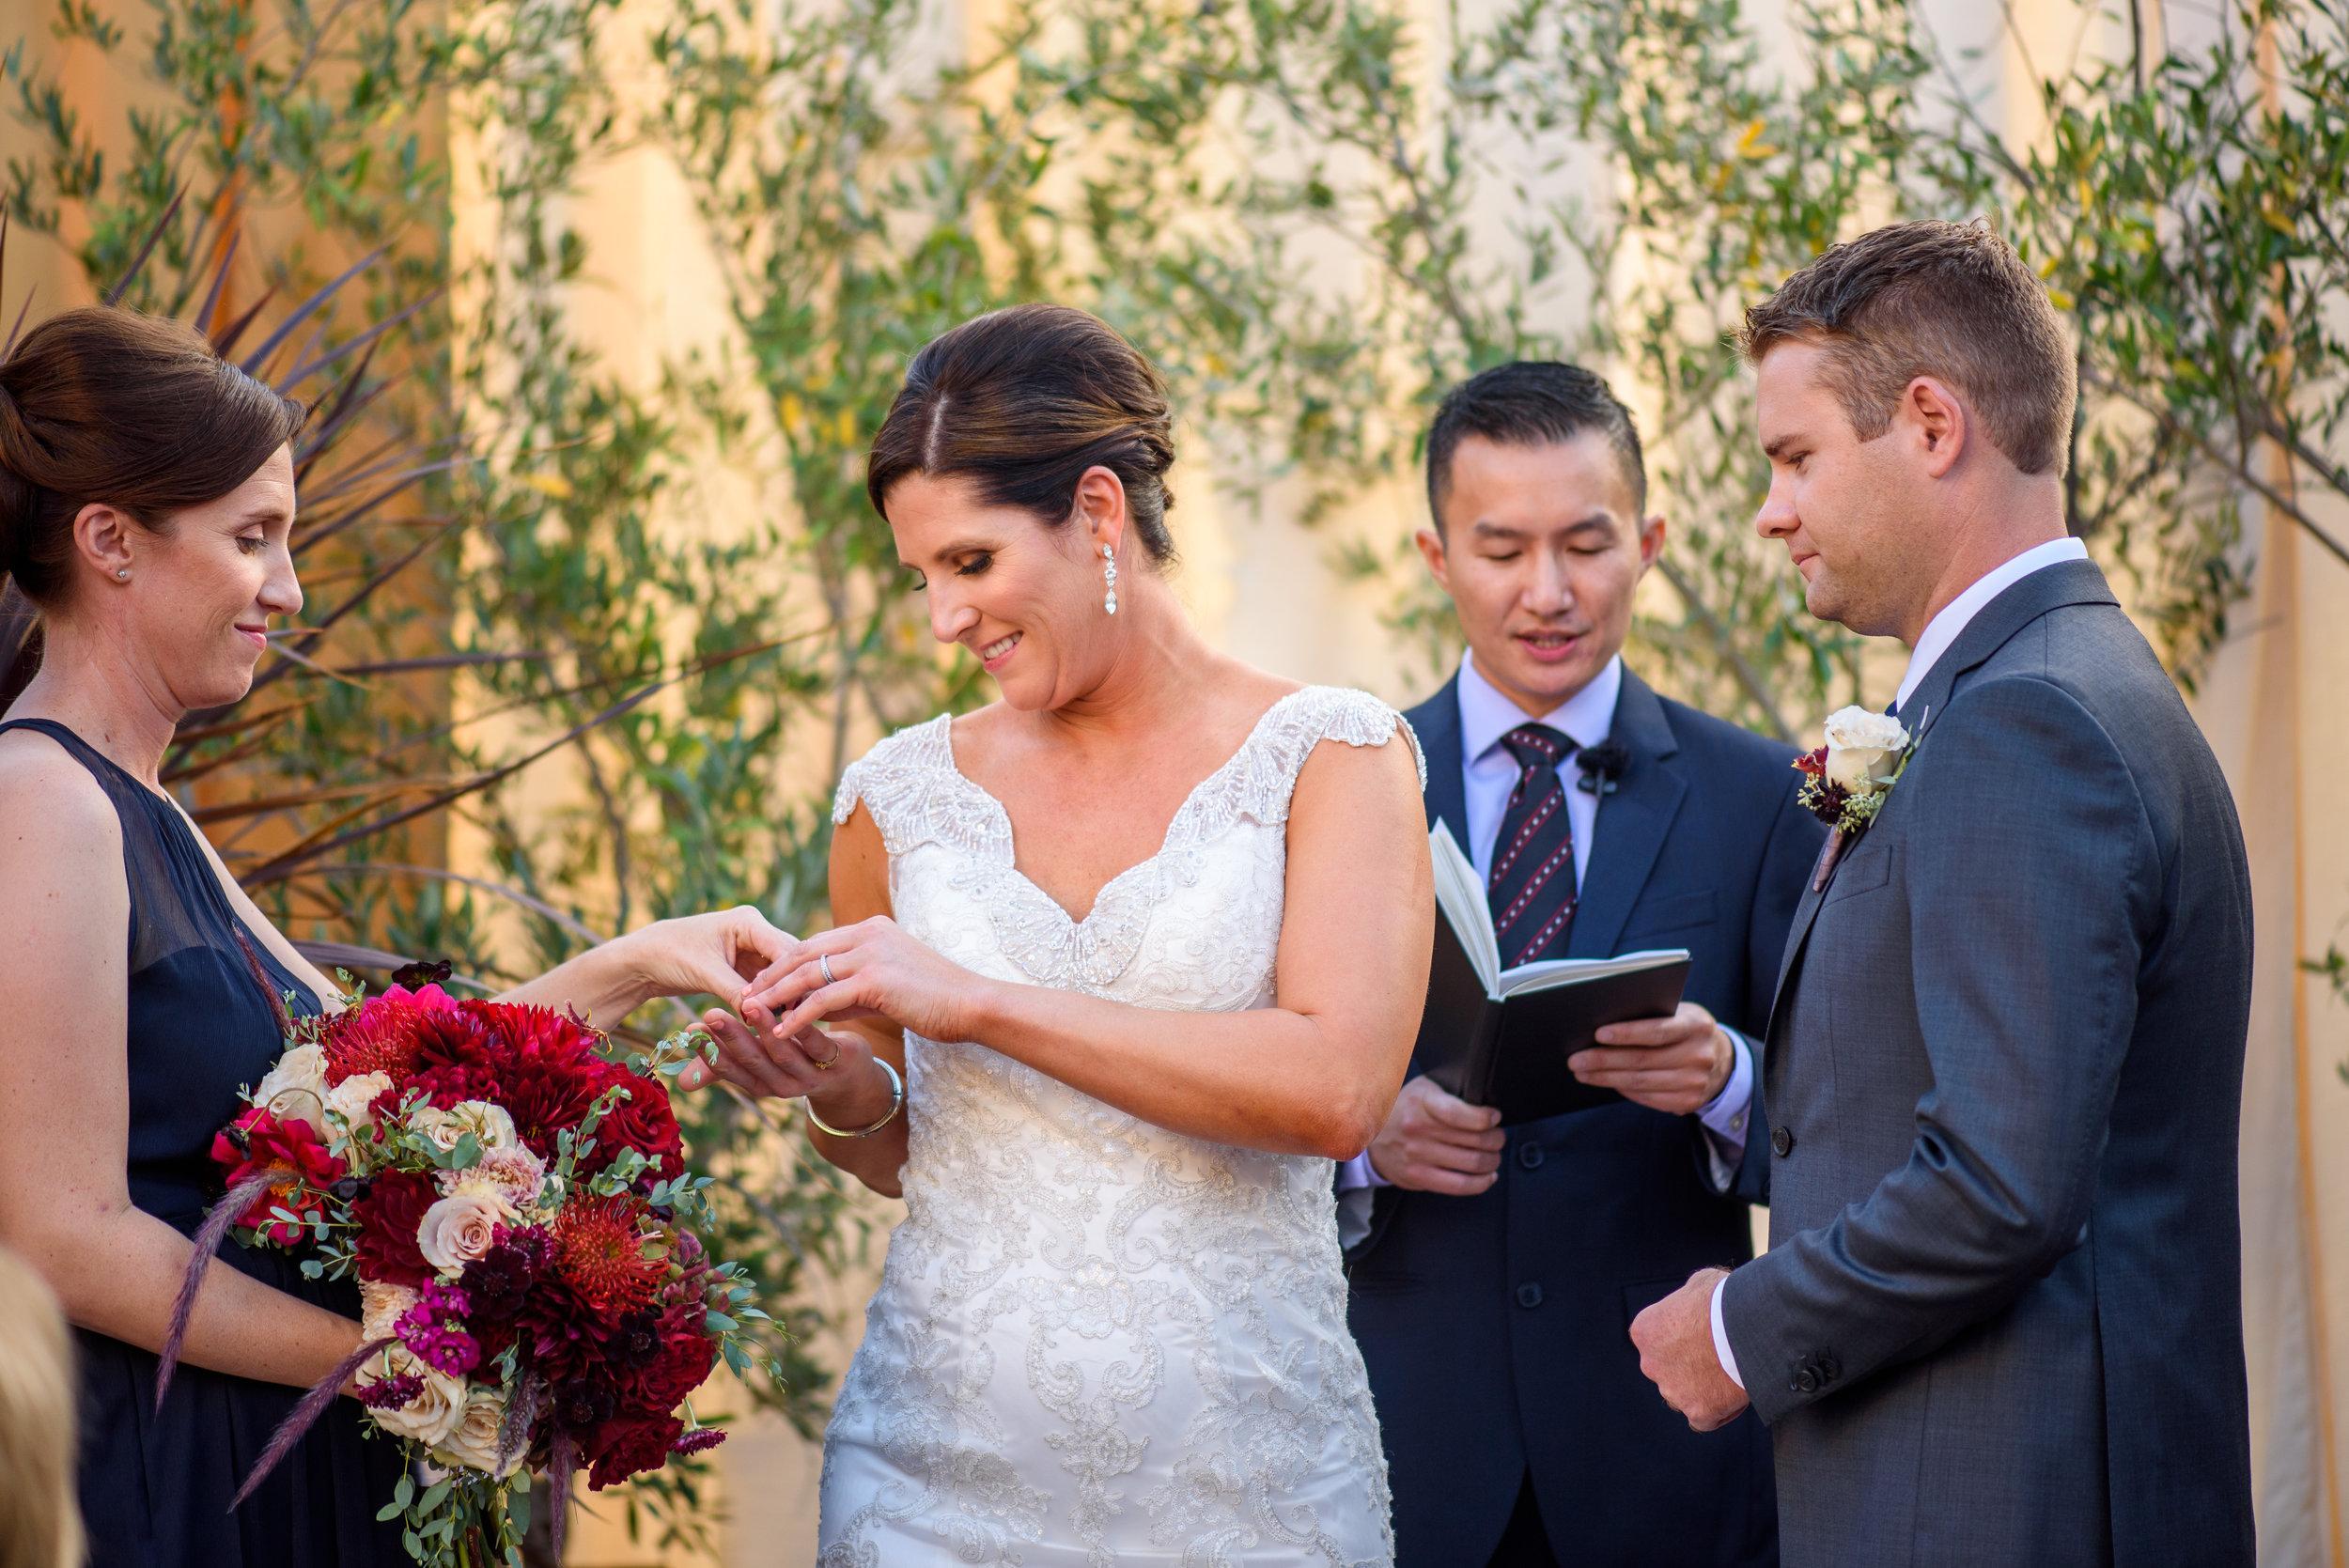 annie-brian-012-antiquite-midtown-sacramento-wedding-photographer-katherine-nicole-photography.JPG